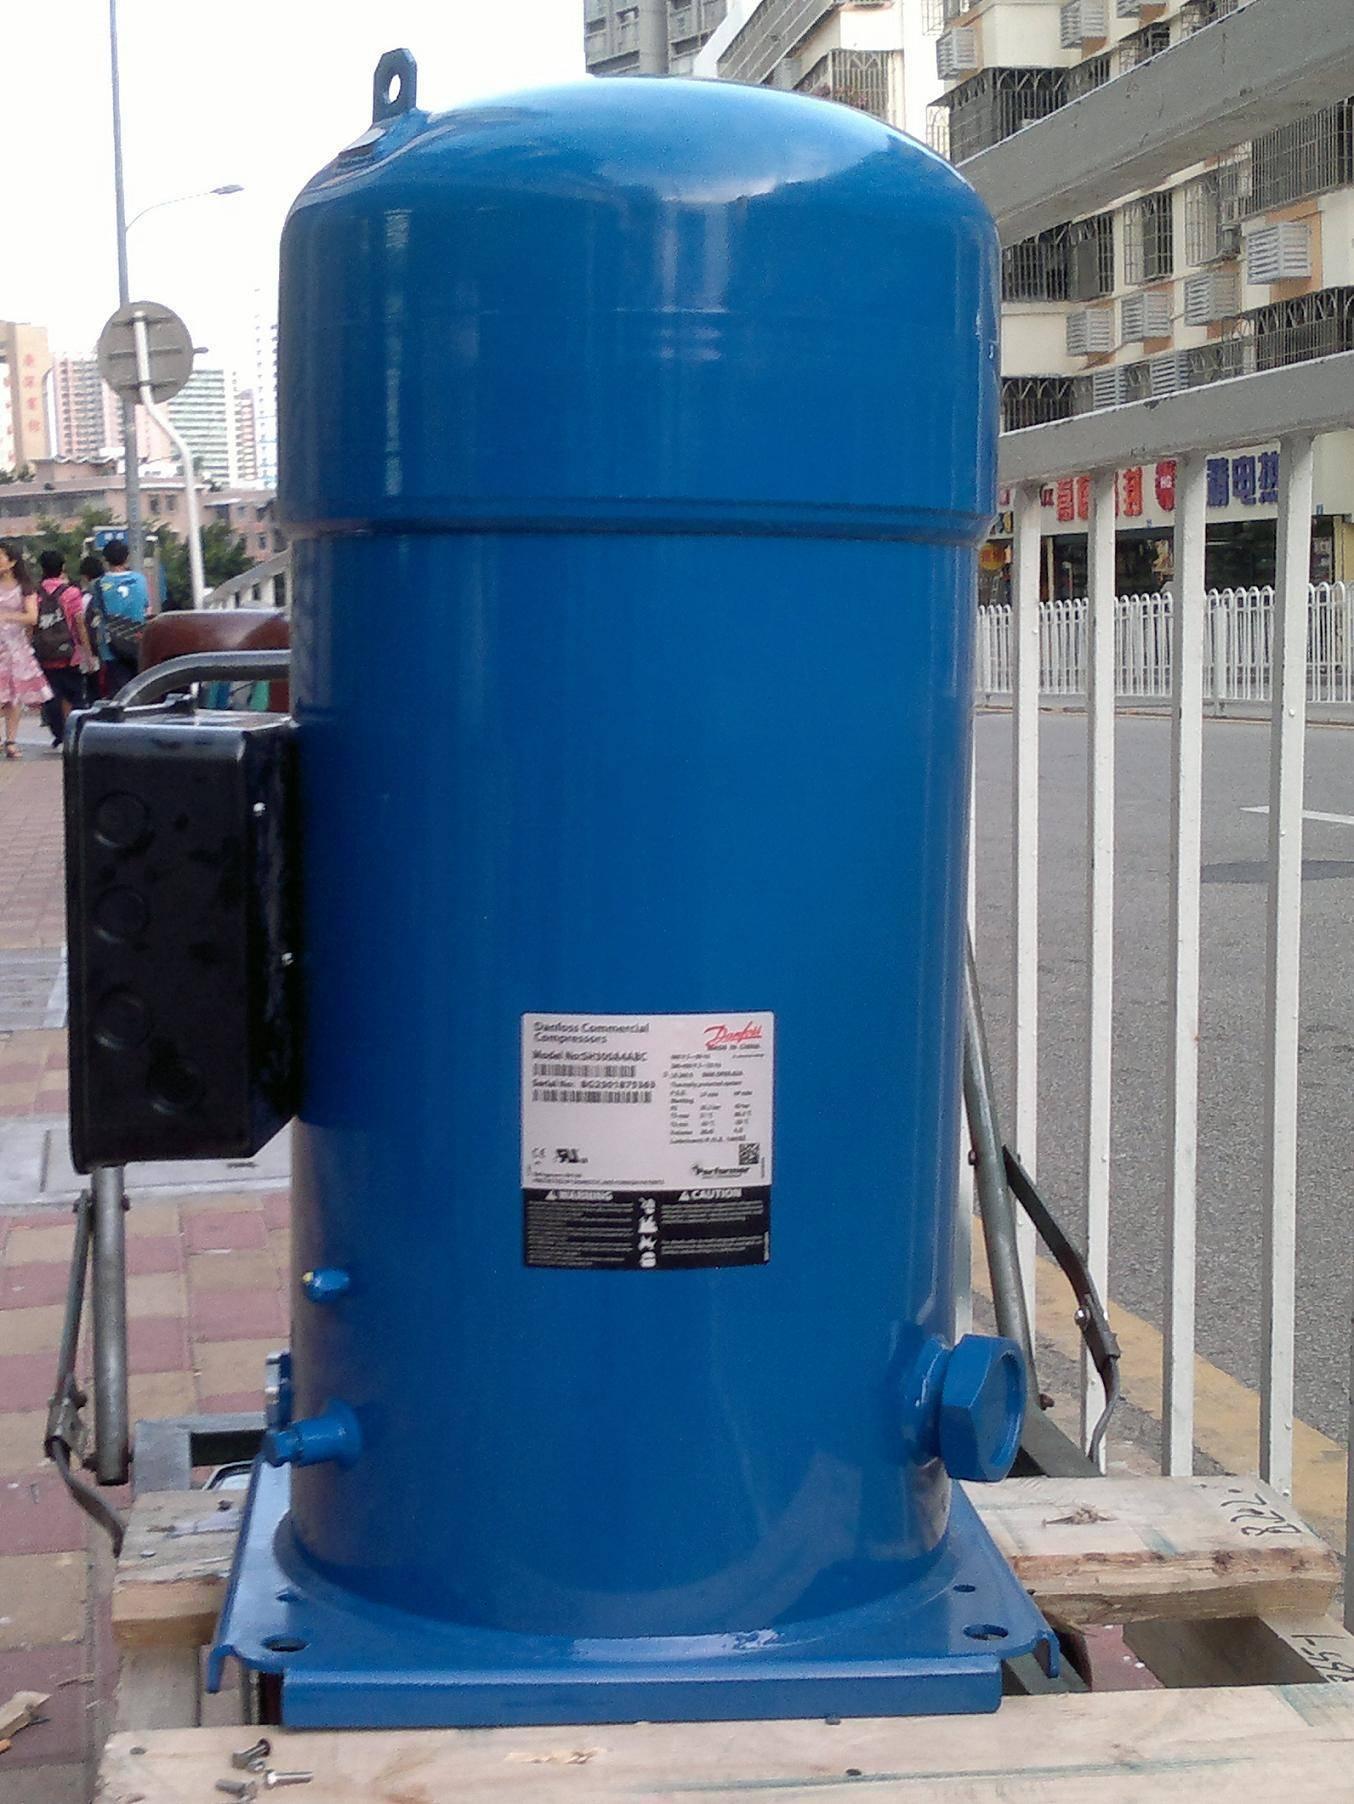 Danfoss Performer Air Conditioning Scroll Compressors